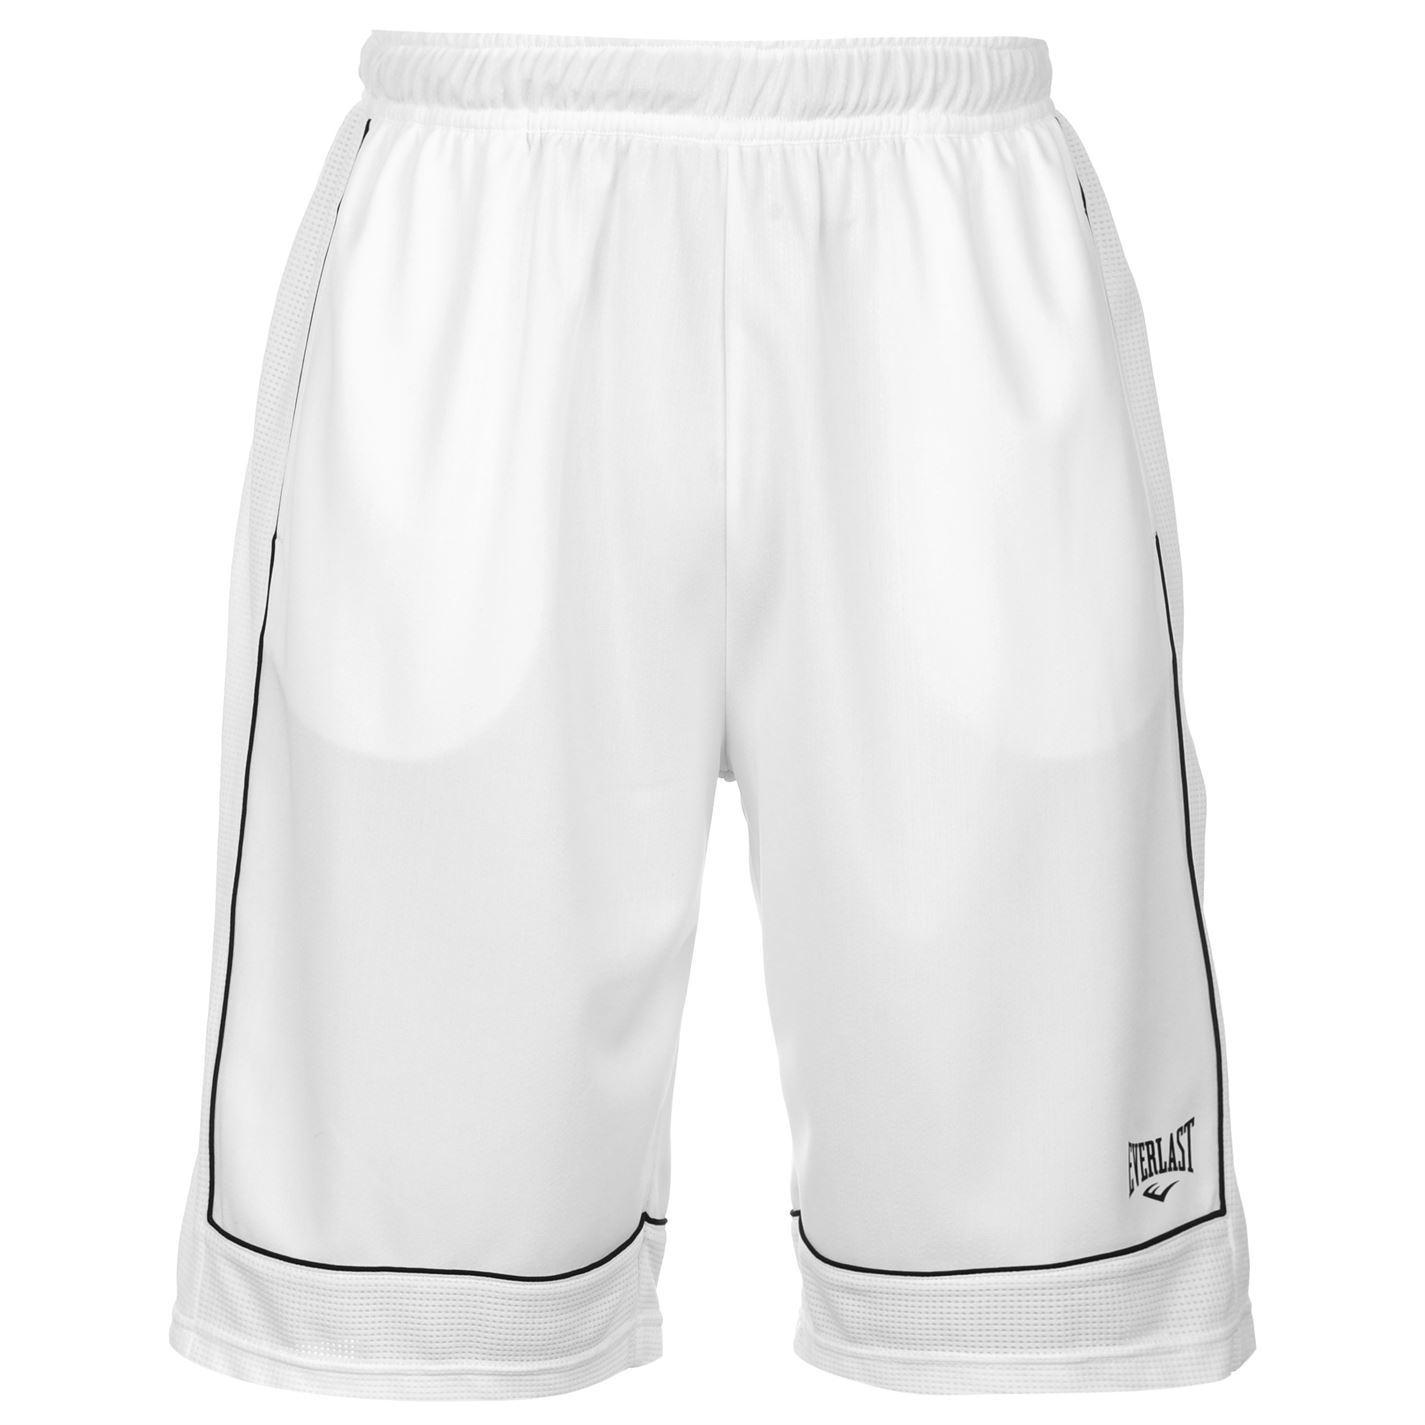 Everlast Basketball Shorts Mens White Black Sportswear Short Ebay